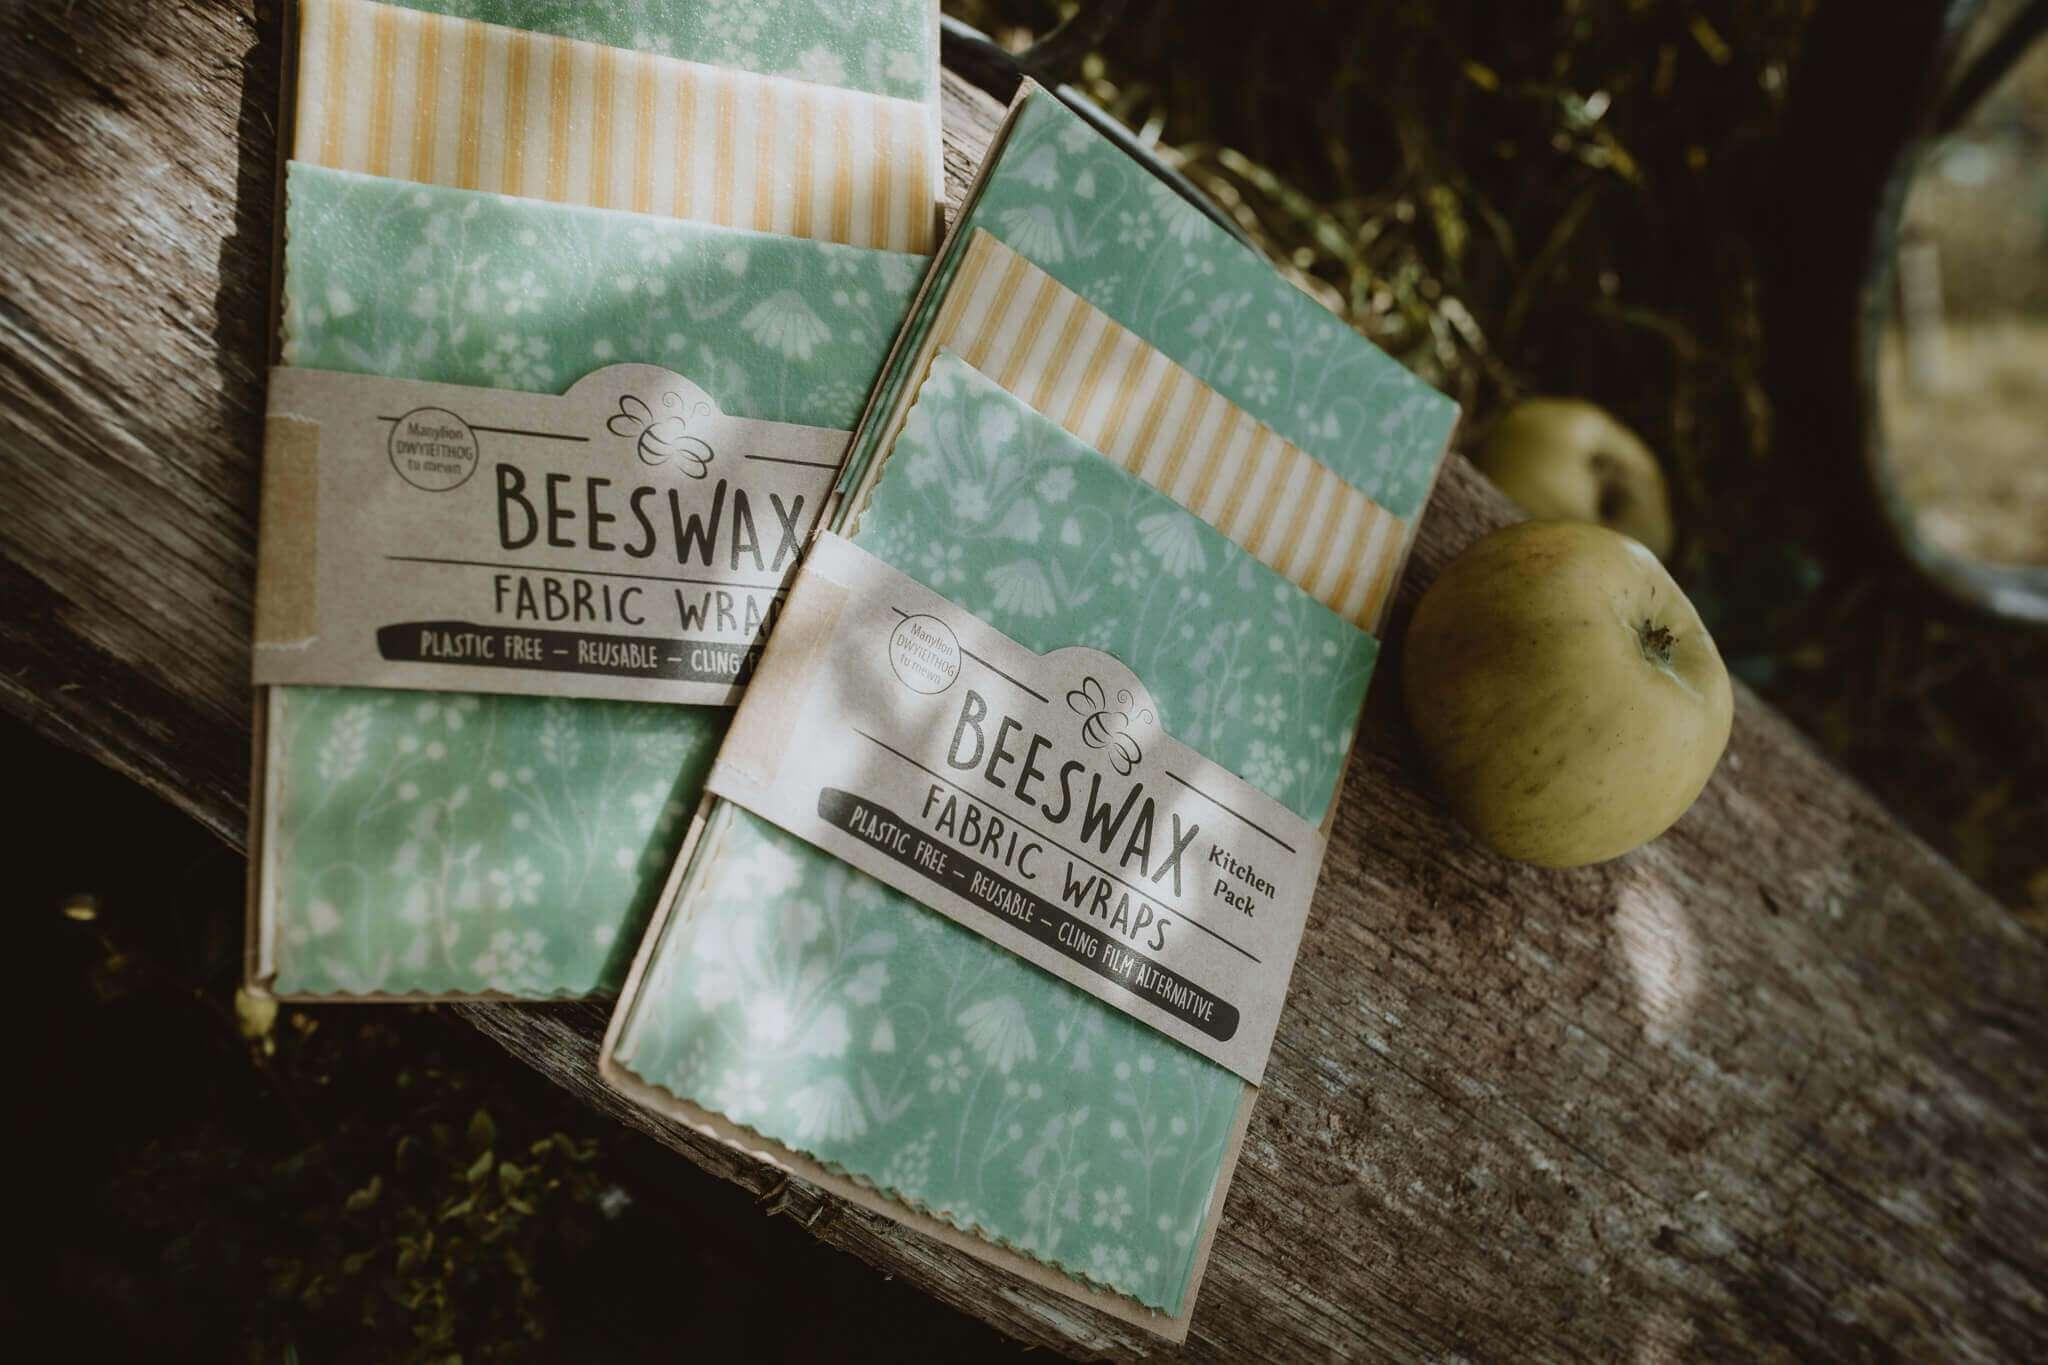 beeswax wraps packs